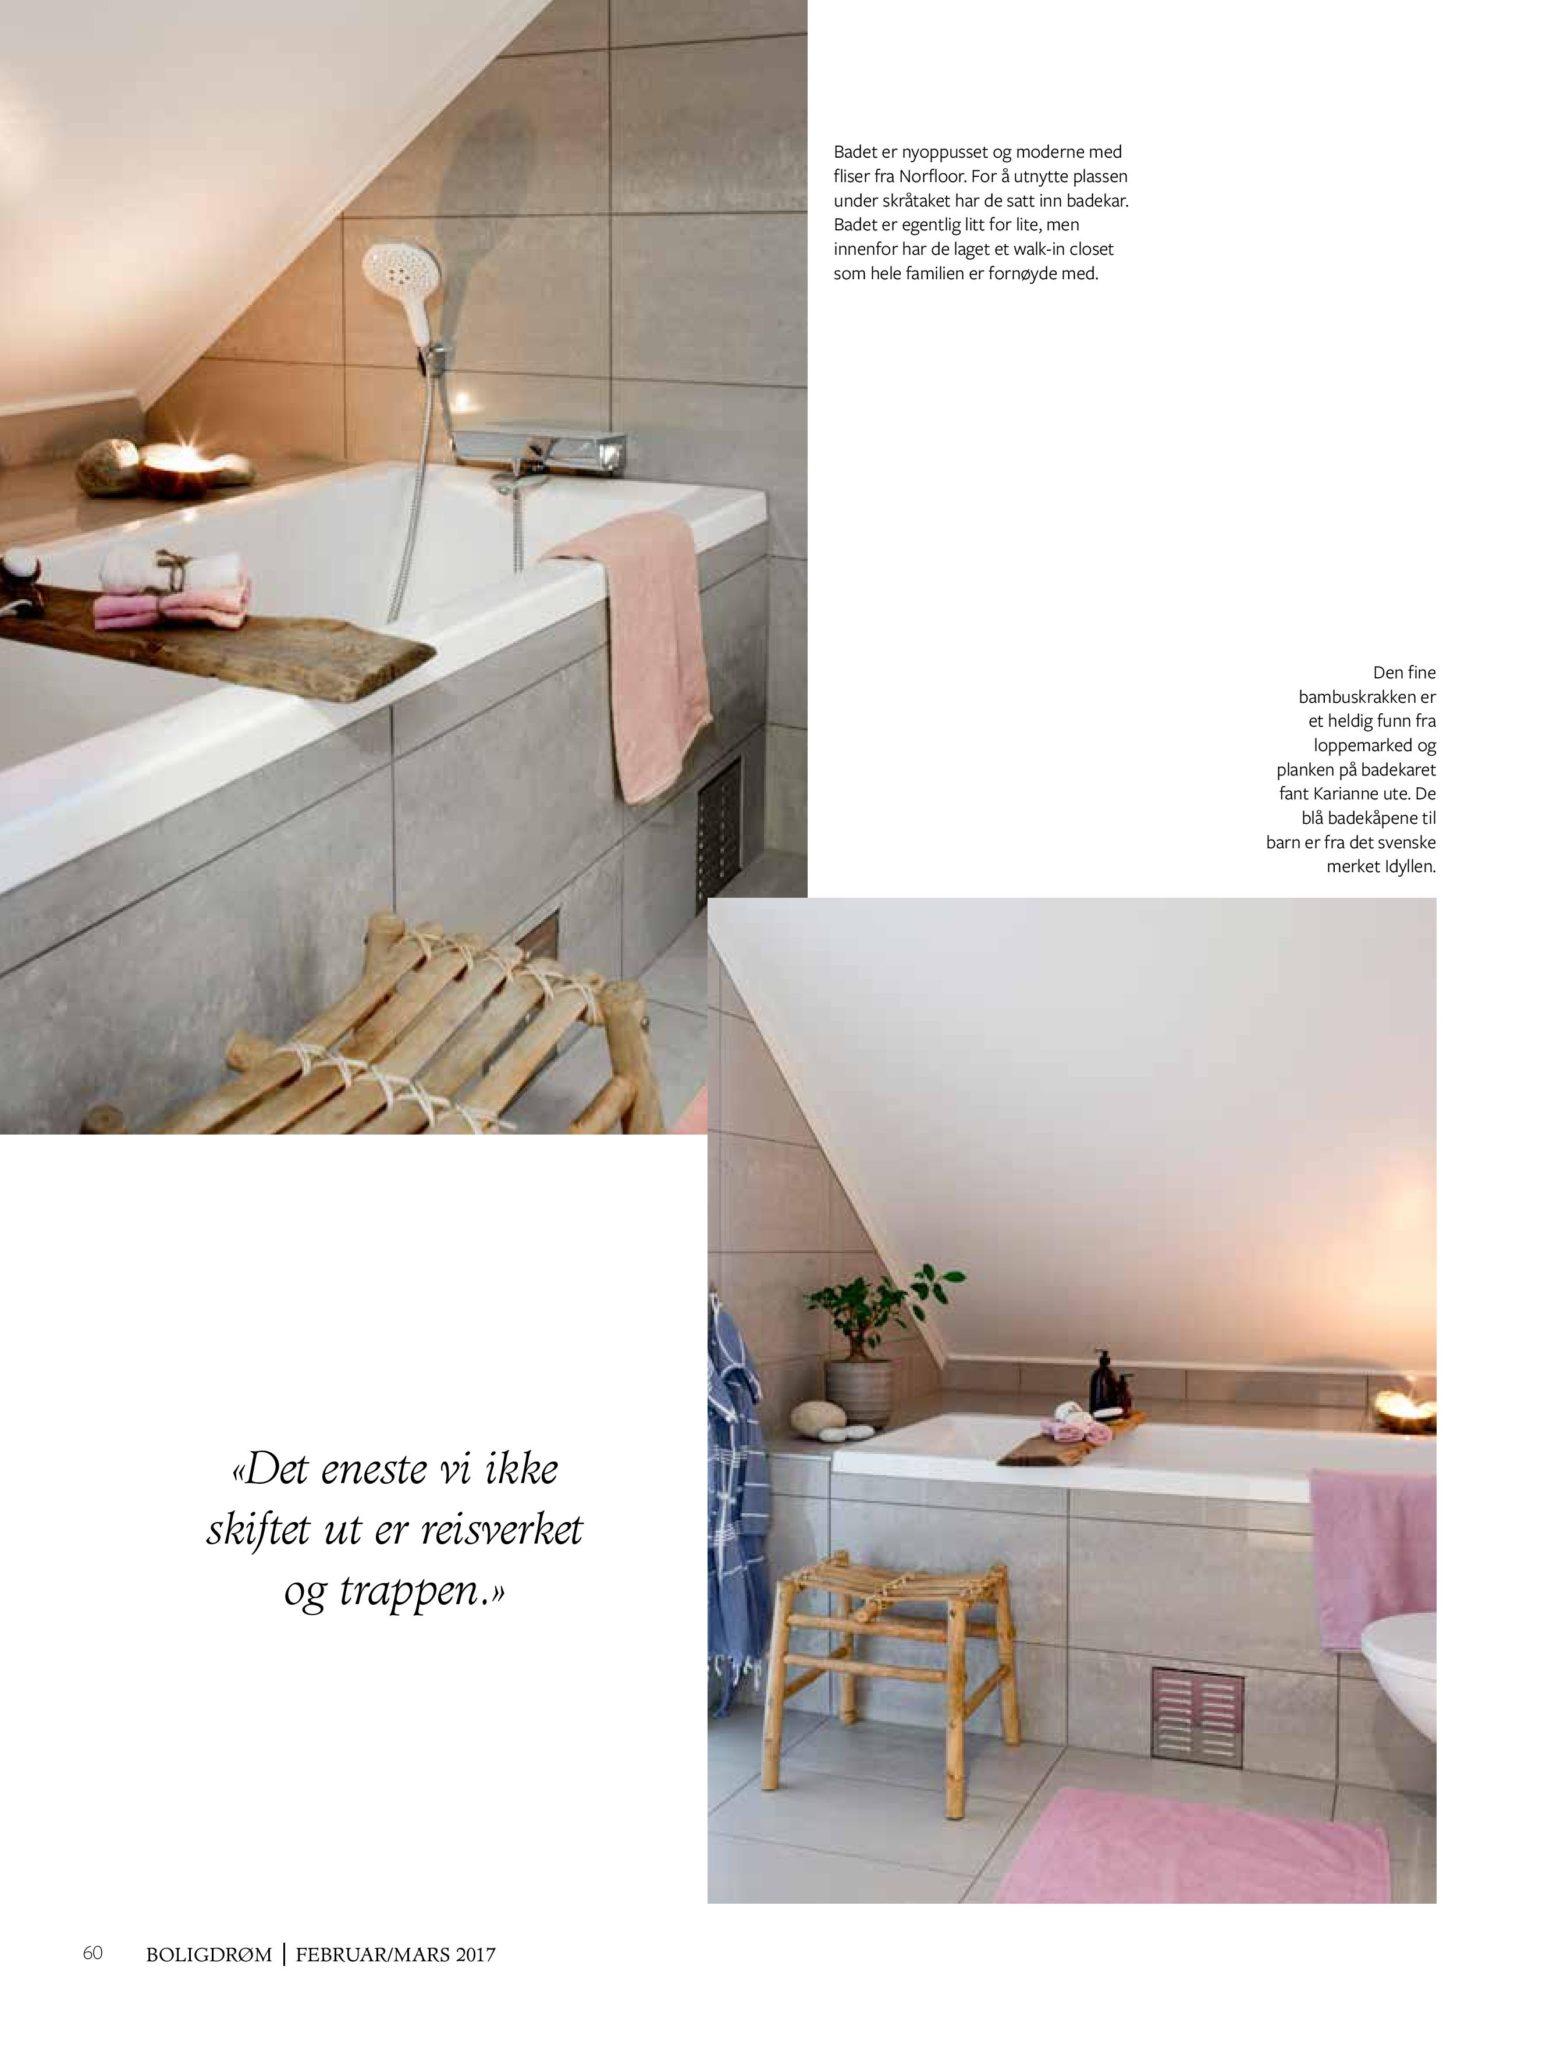 boligreportasje Karianne Gustavsen BoligDrøm nr. 2/2017 side 13